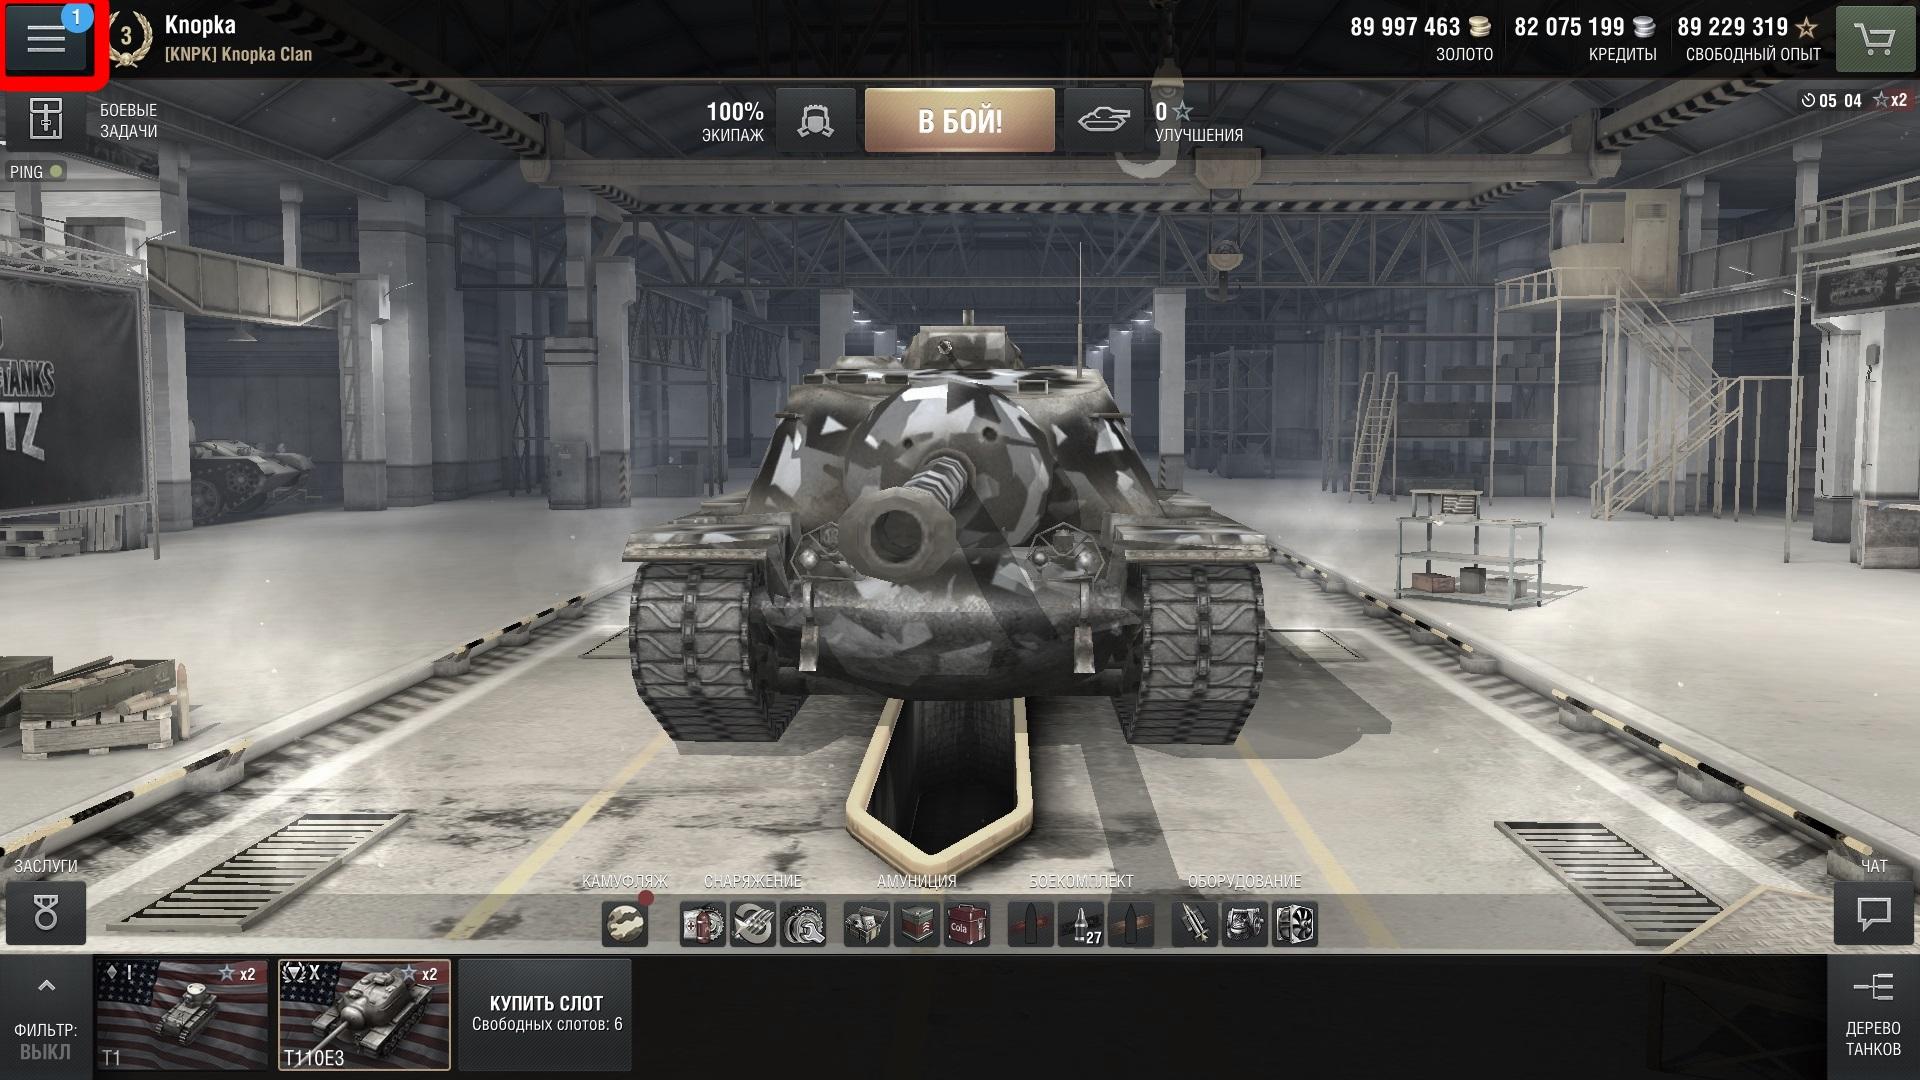 World of tanks турниры [PUNIQRANDLINE-(au-dating-names.txt) 56